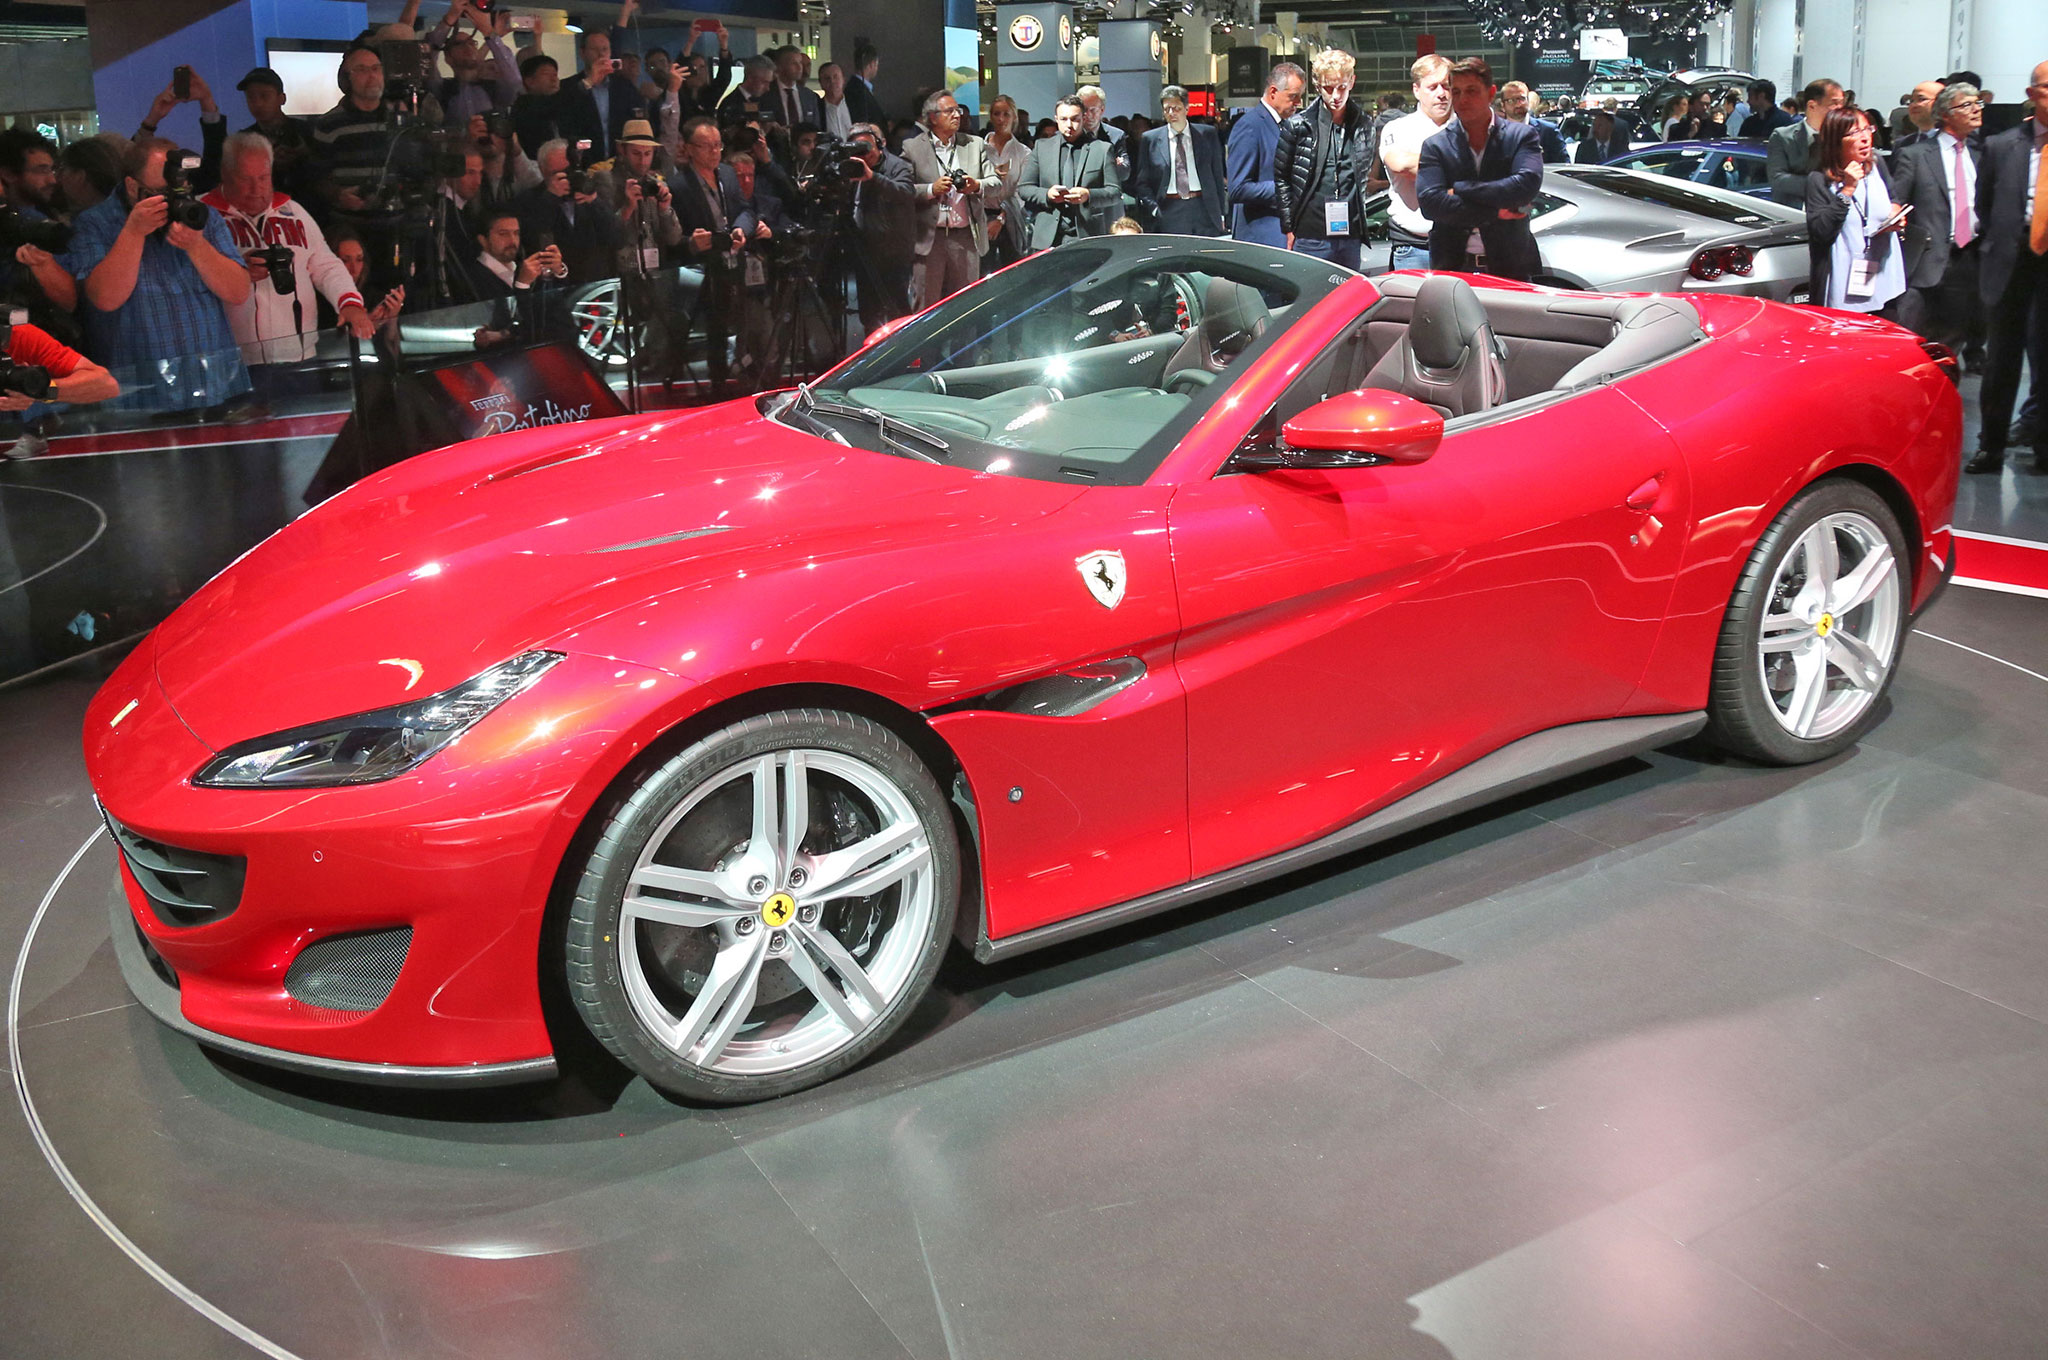 Ferrari-Portofino-in-Frankfurt-front-side-view.jpg